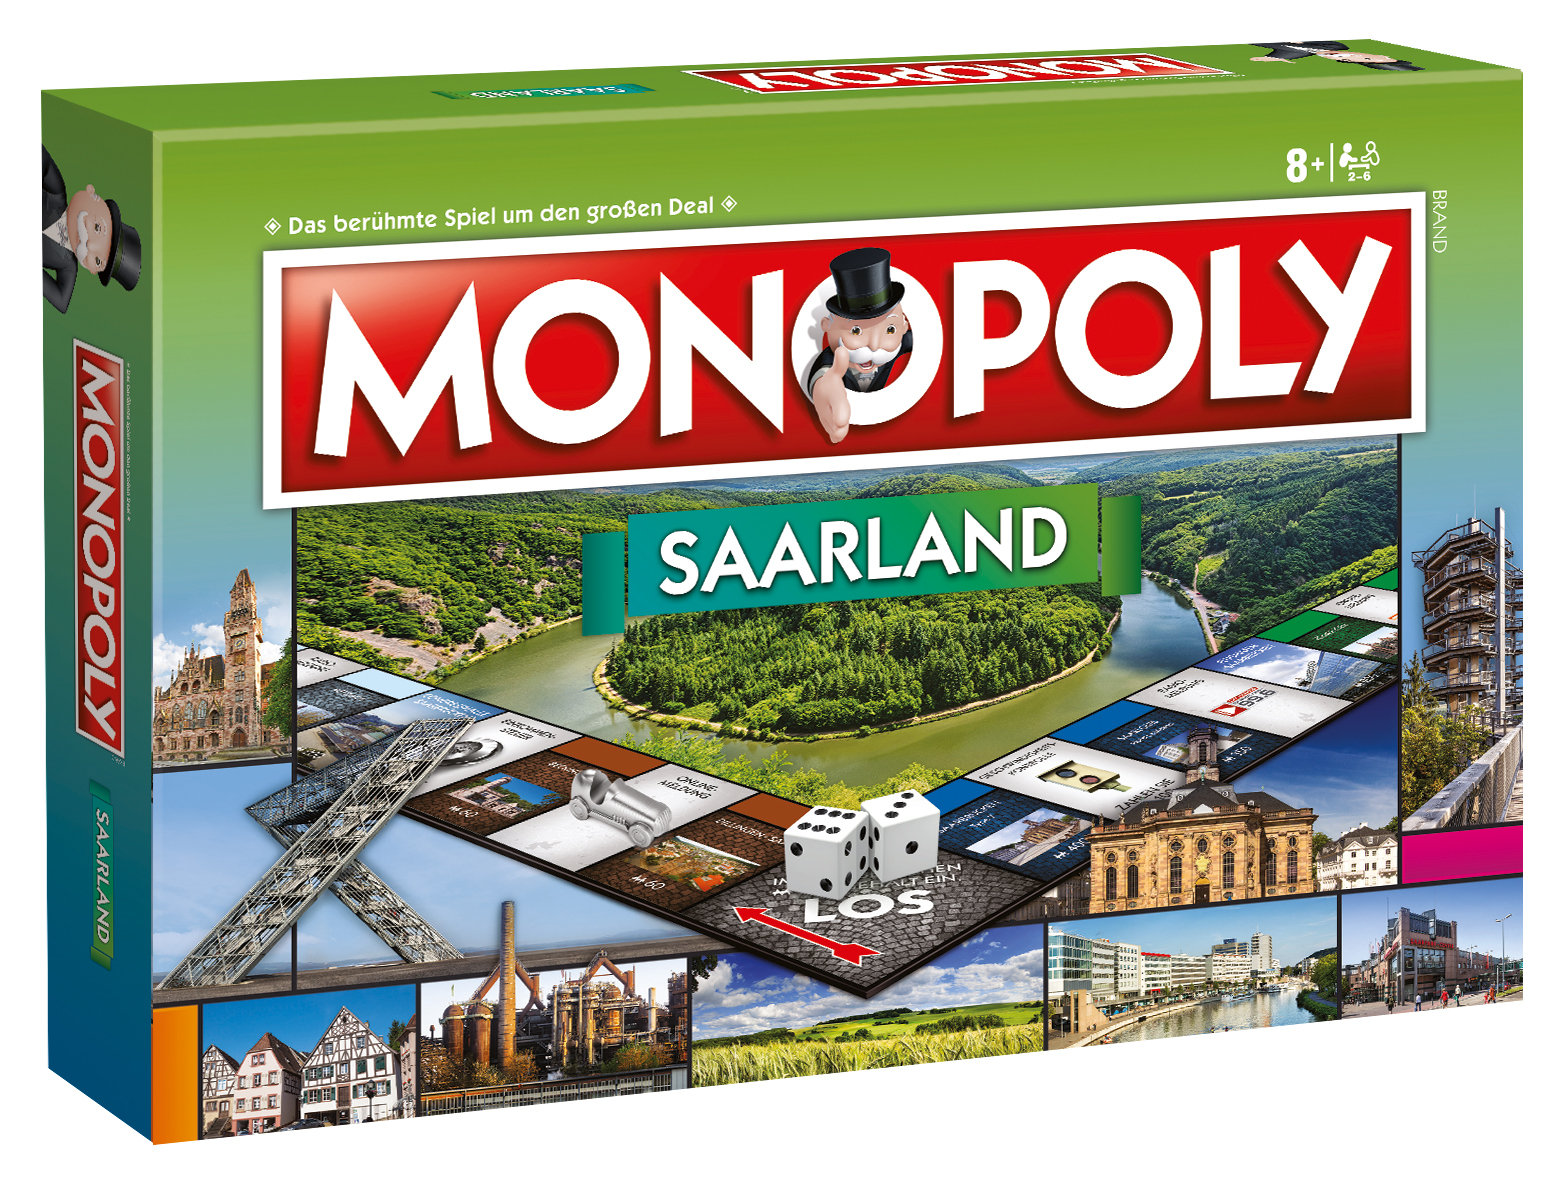 Monopoly Saarland